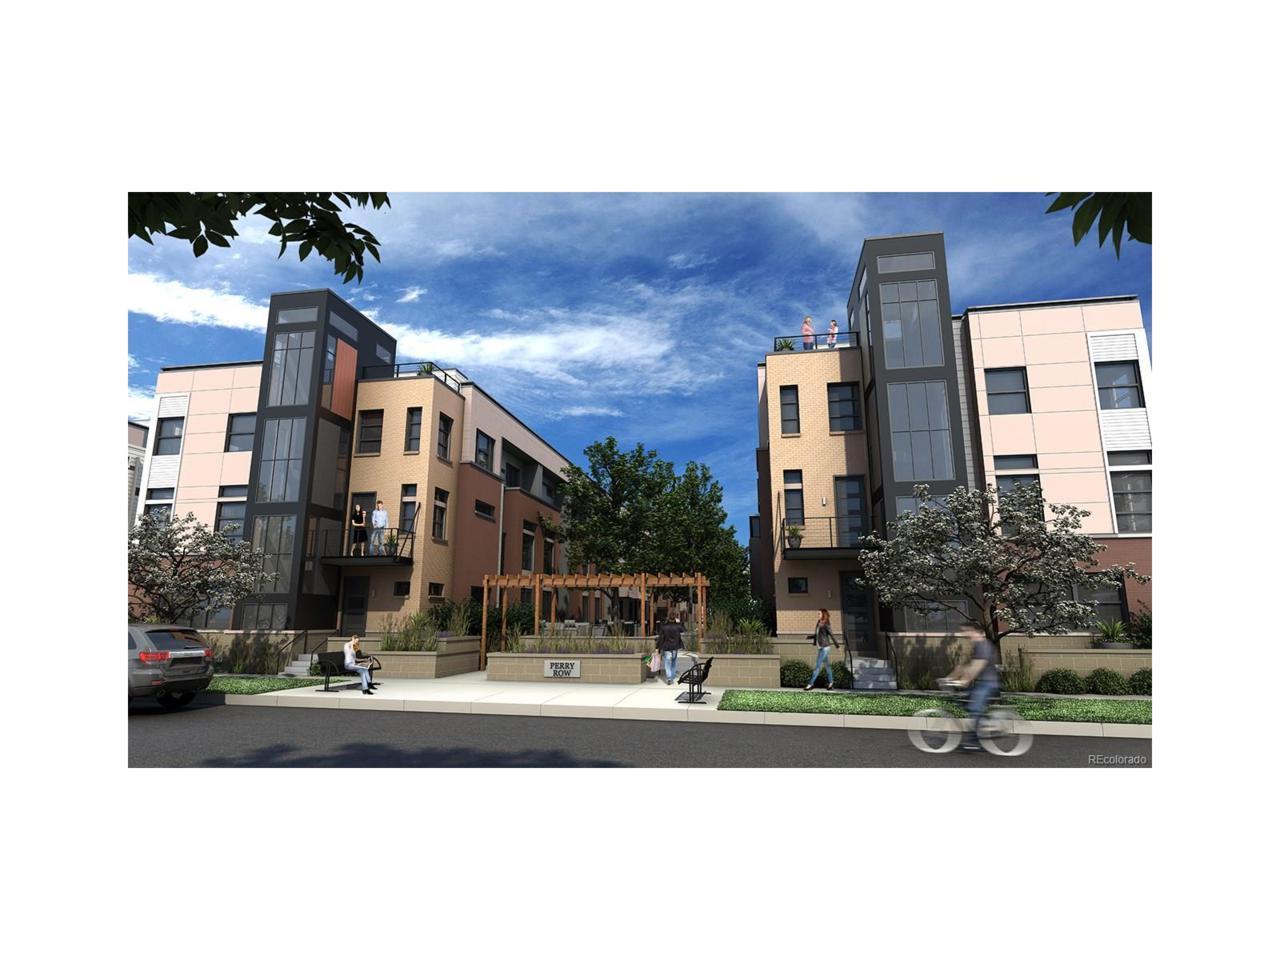 4031 W Conejos Place, Denver, CO 80204 (MLS #5176219) :: 8z Real Estate